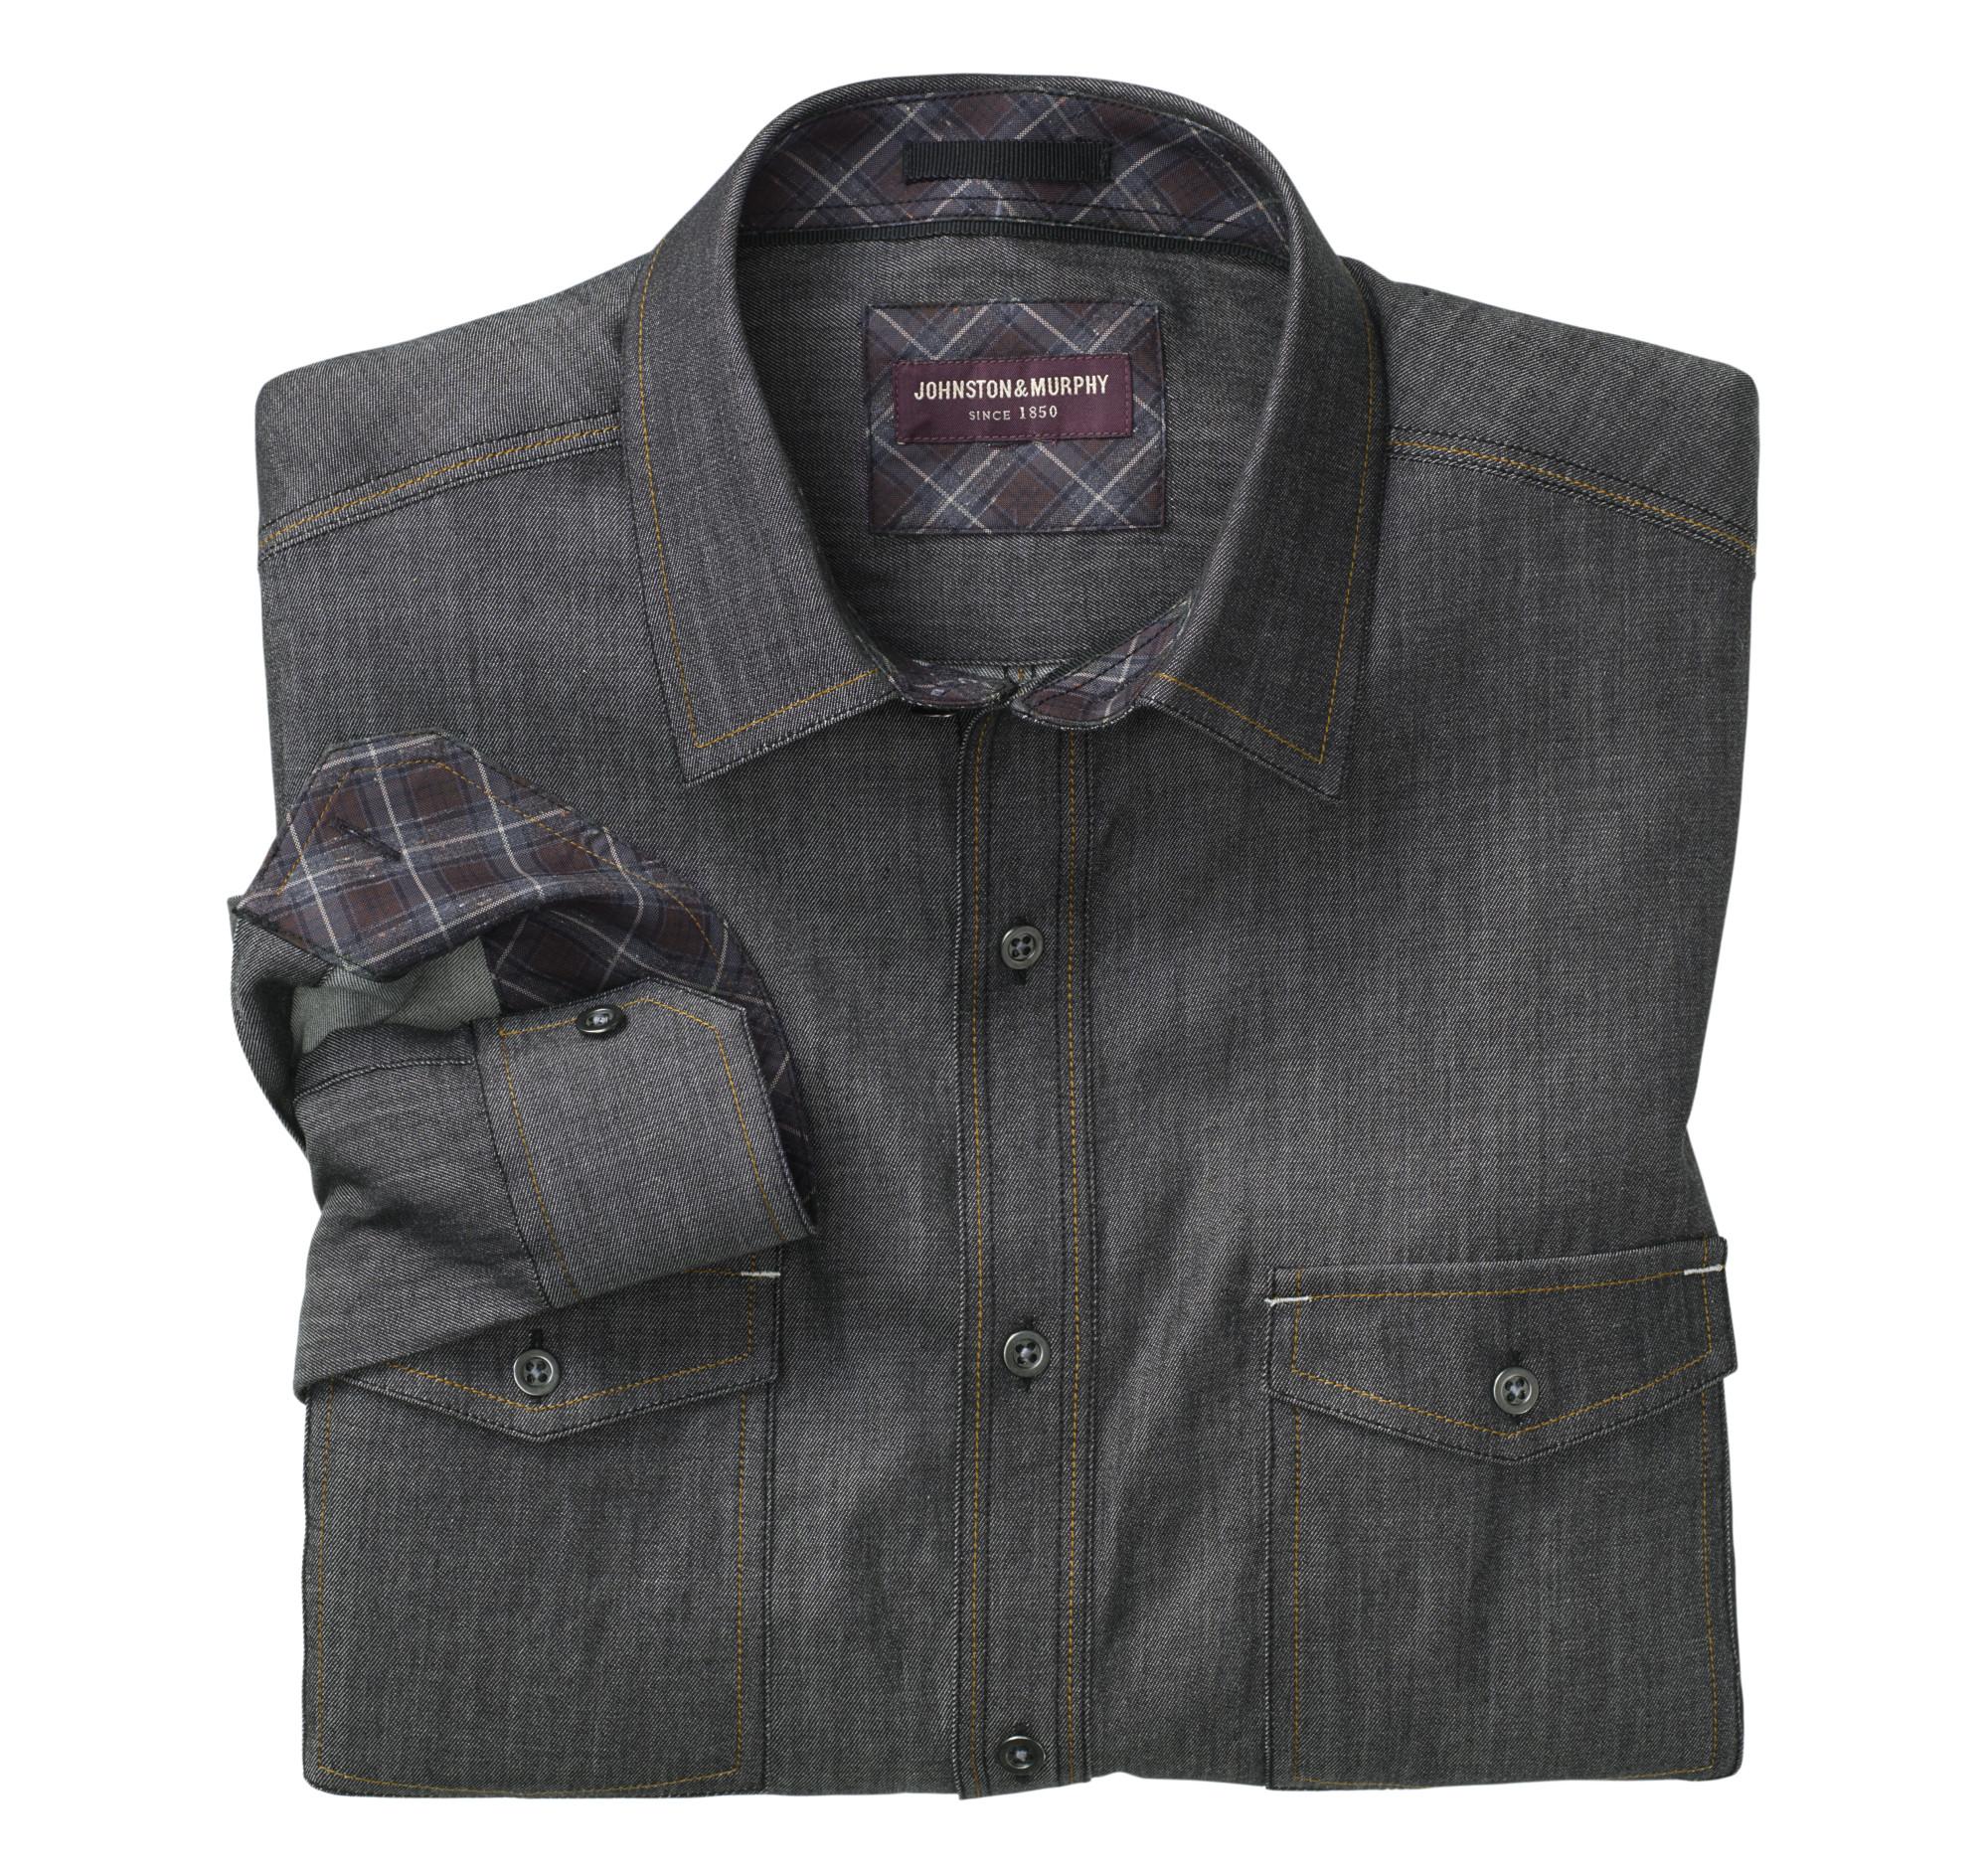 Double Pocket Denim Shirt Johnston Murphy